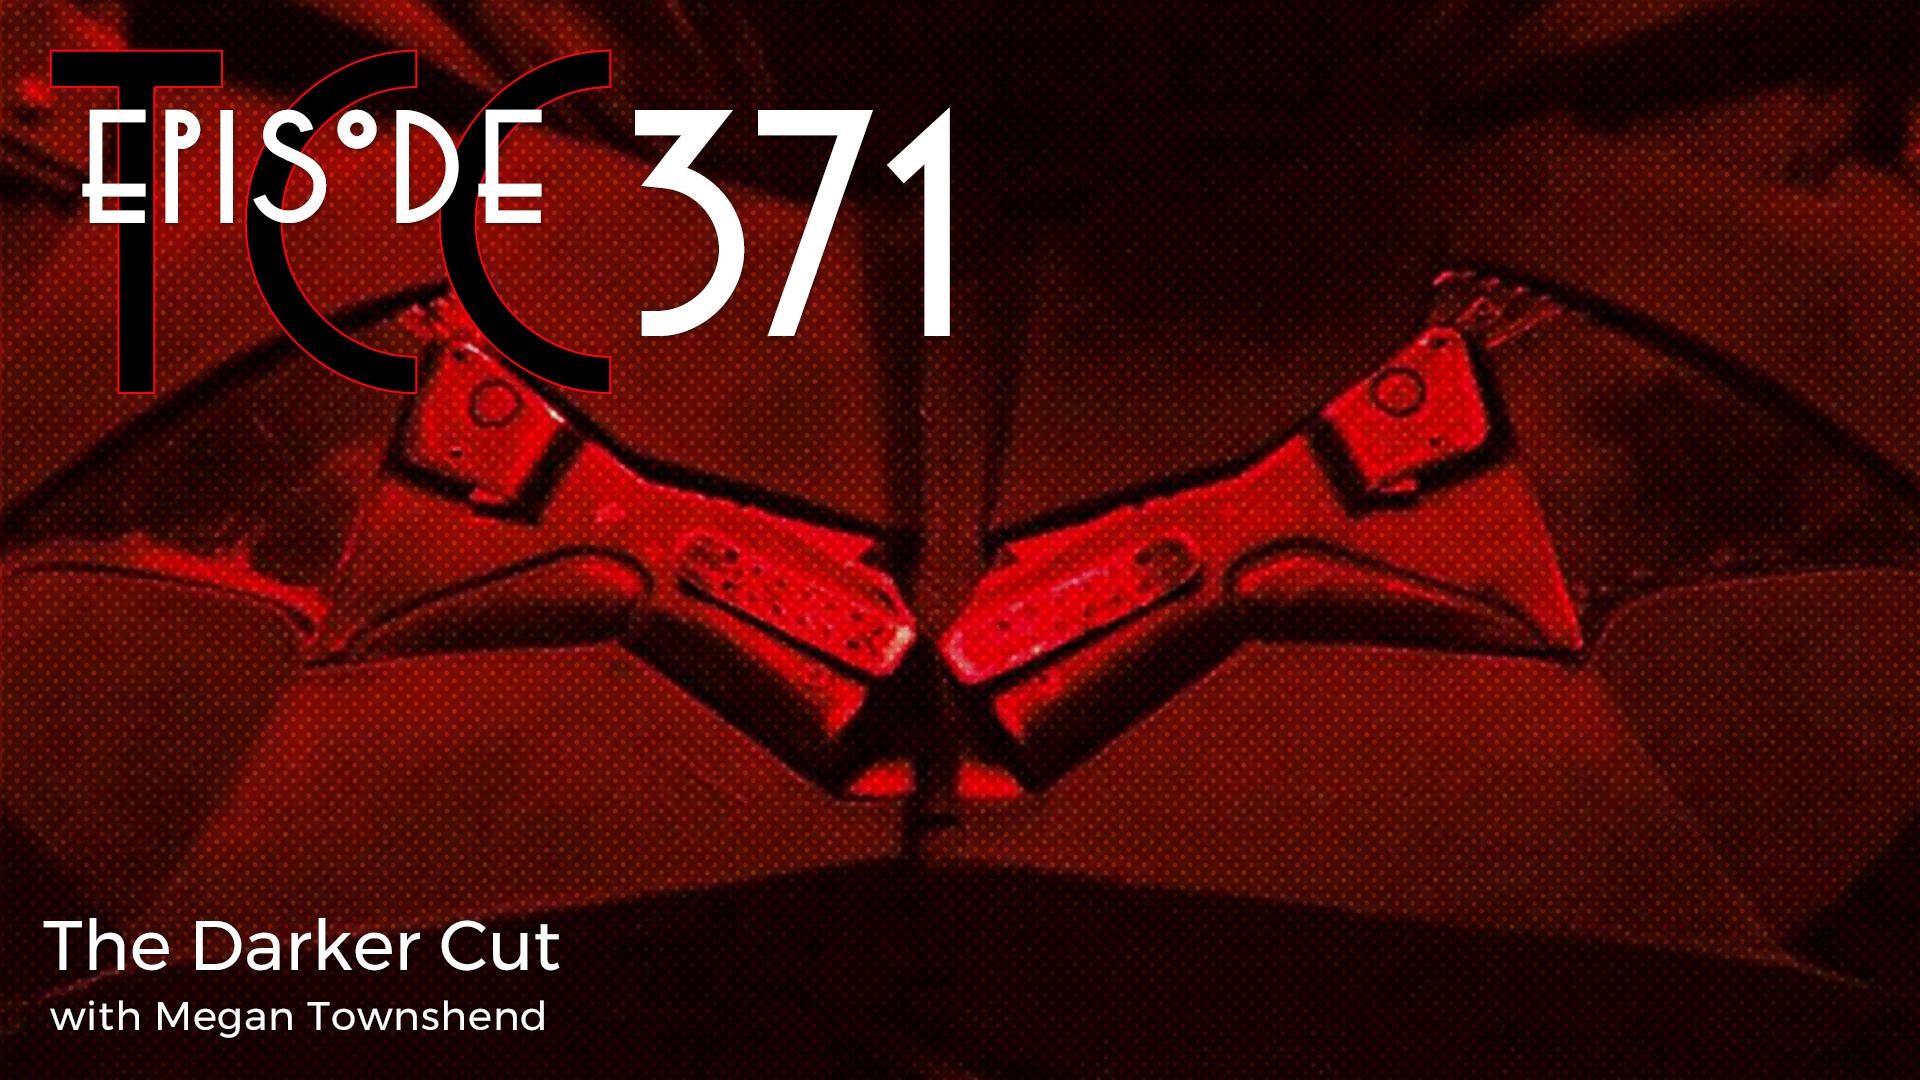 The Citadel Cafe 371: The Darker Cut